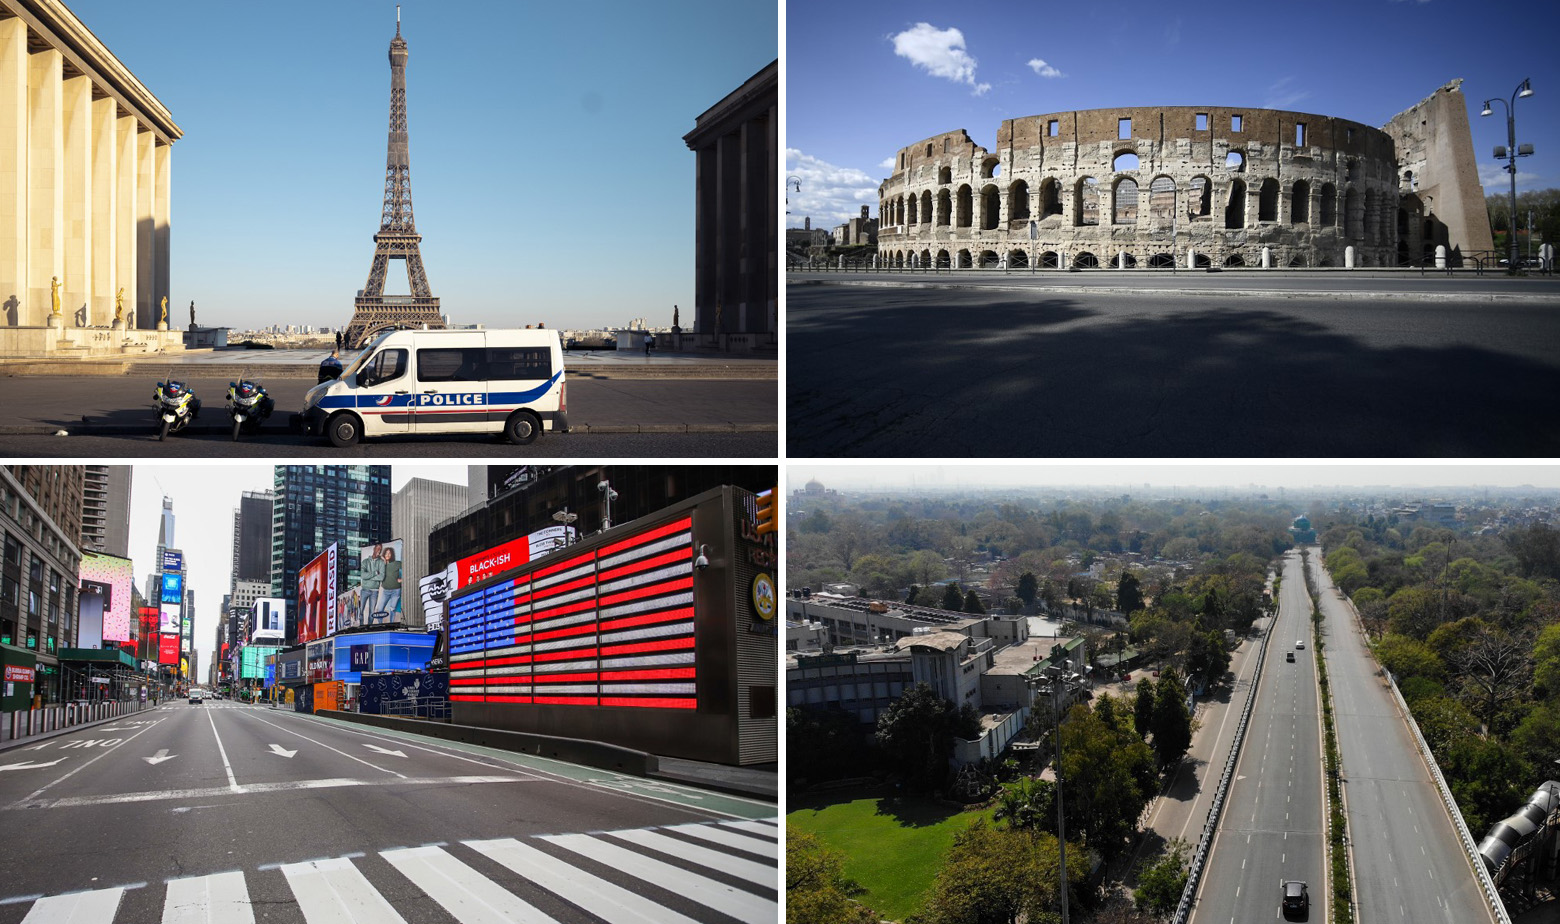 Pariz (gore lijevo), Rim (gore desno), New York (dolje lijevo), New Delhi (dolje desno)